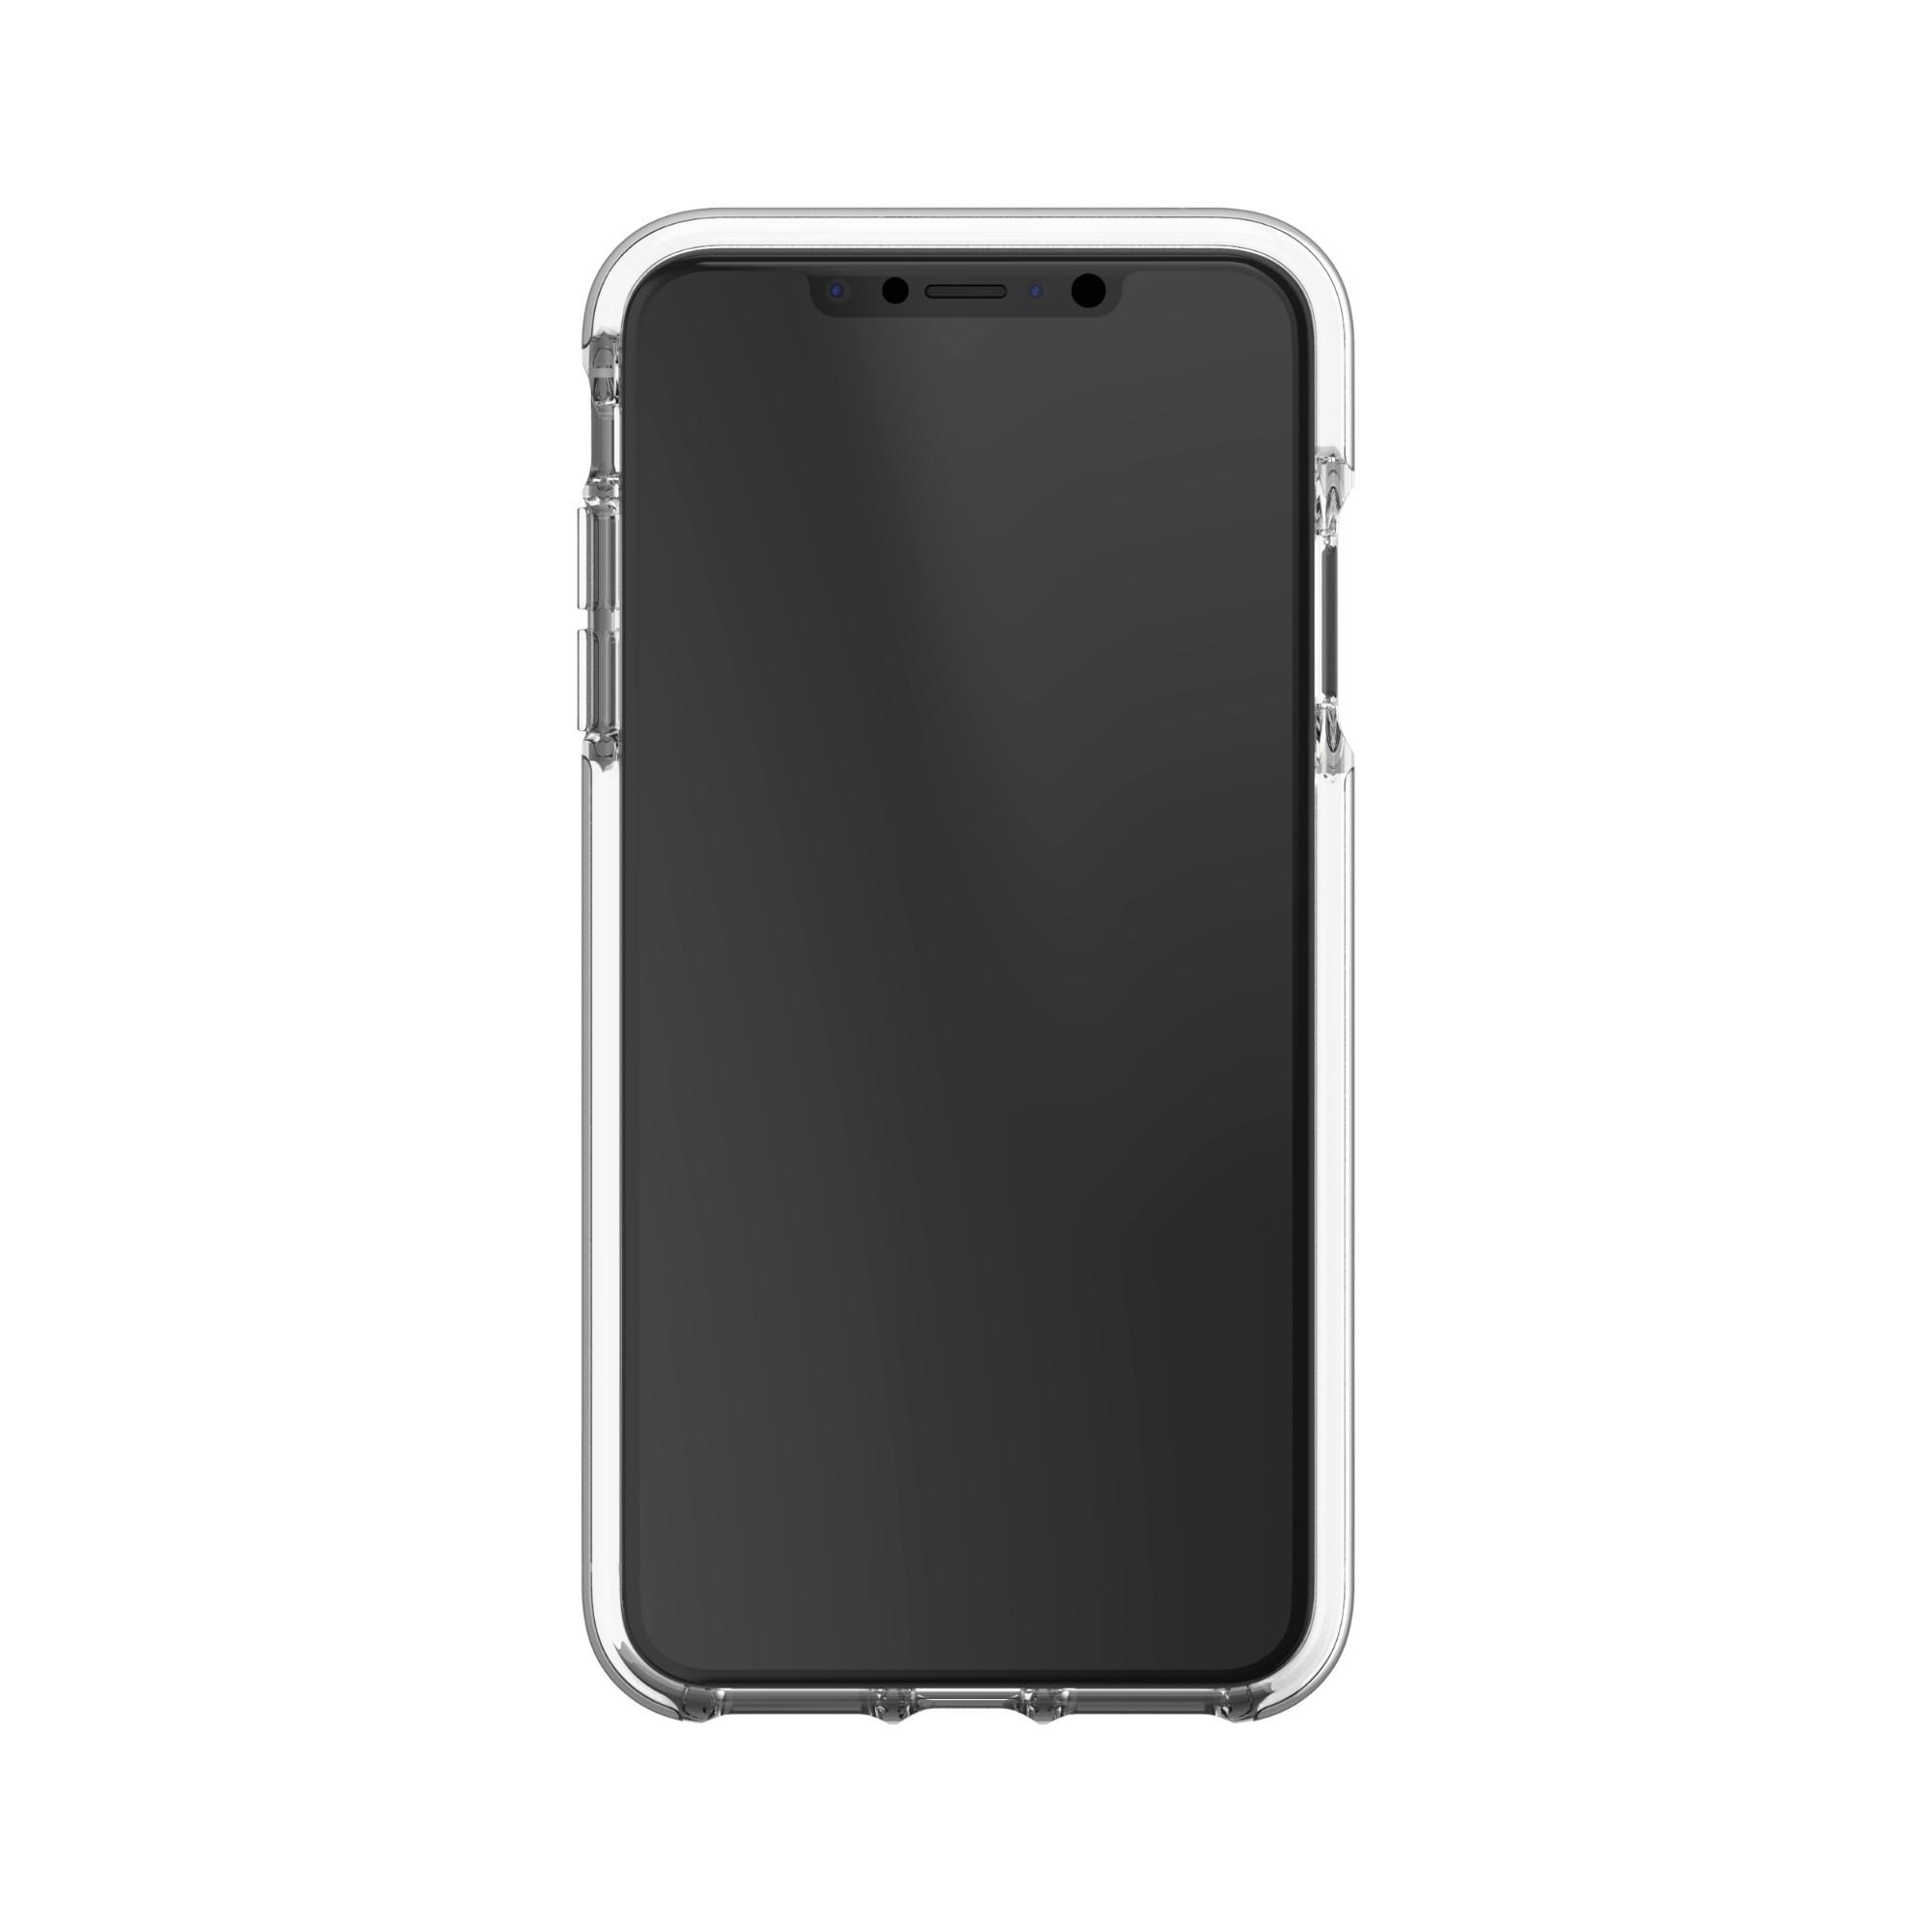 "GEAR4 Piccadilly funda para teléfono móvil 16,5 cm (6.5"") Blanco"